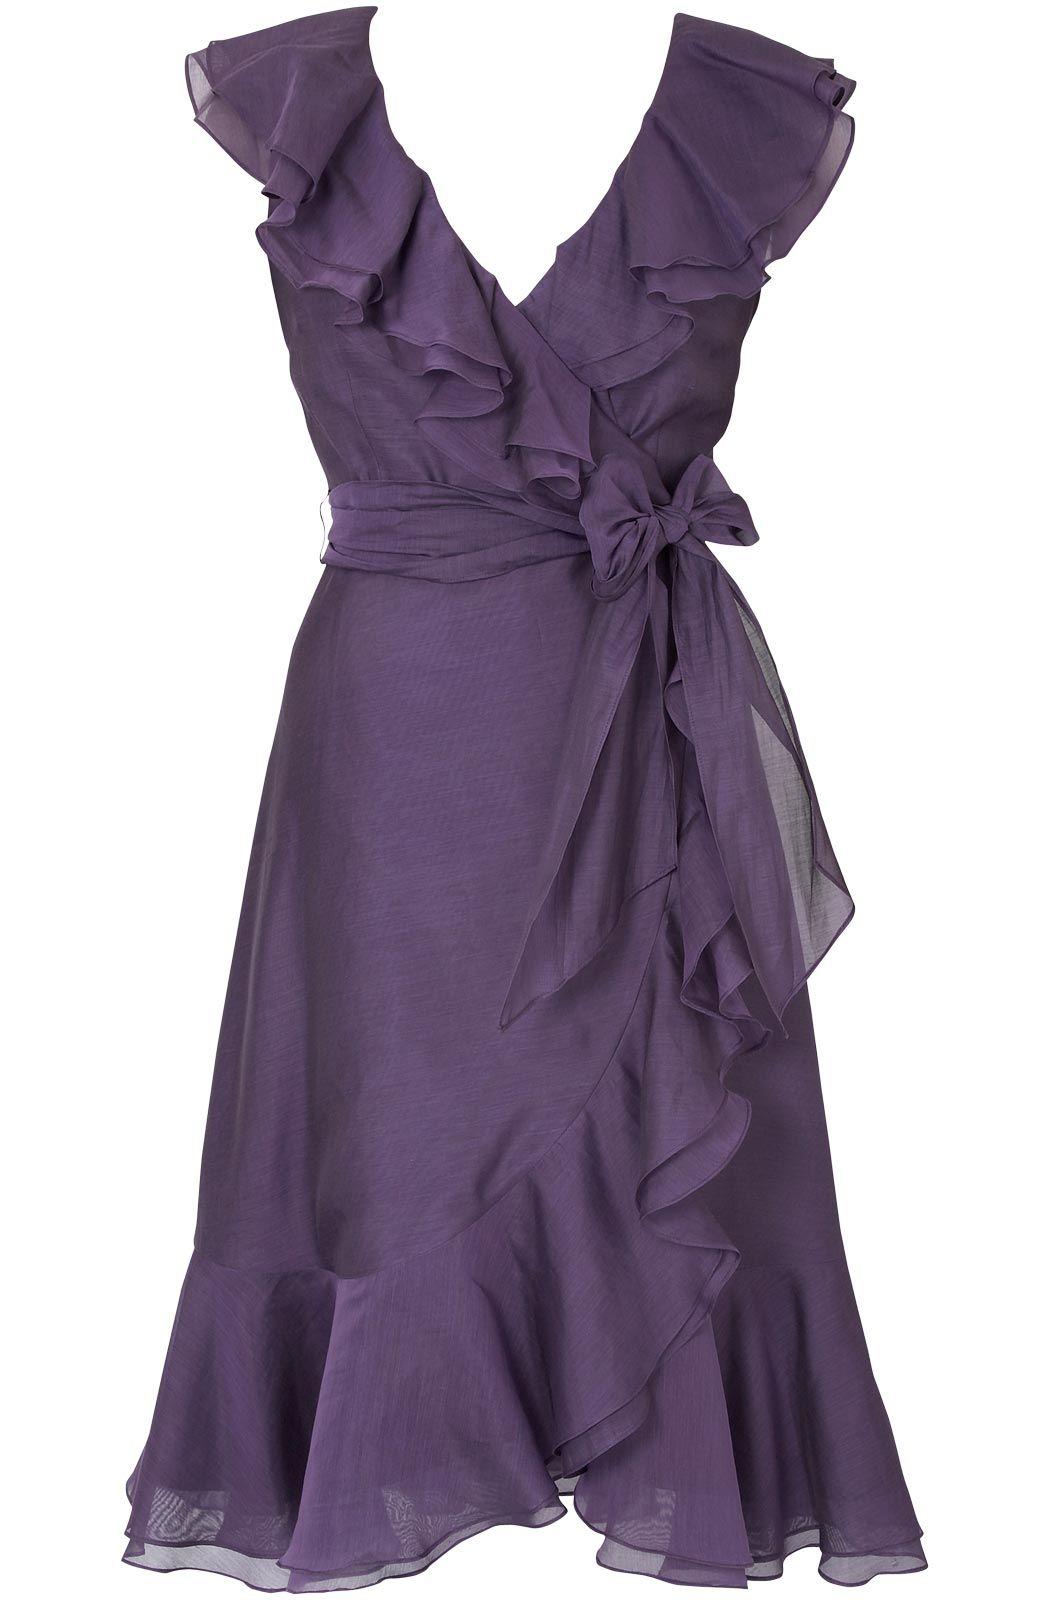 purple ruffles | Purple Passion | Pinterest | Lindo, Vestiditos y ...